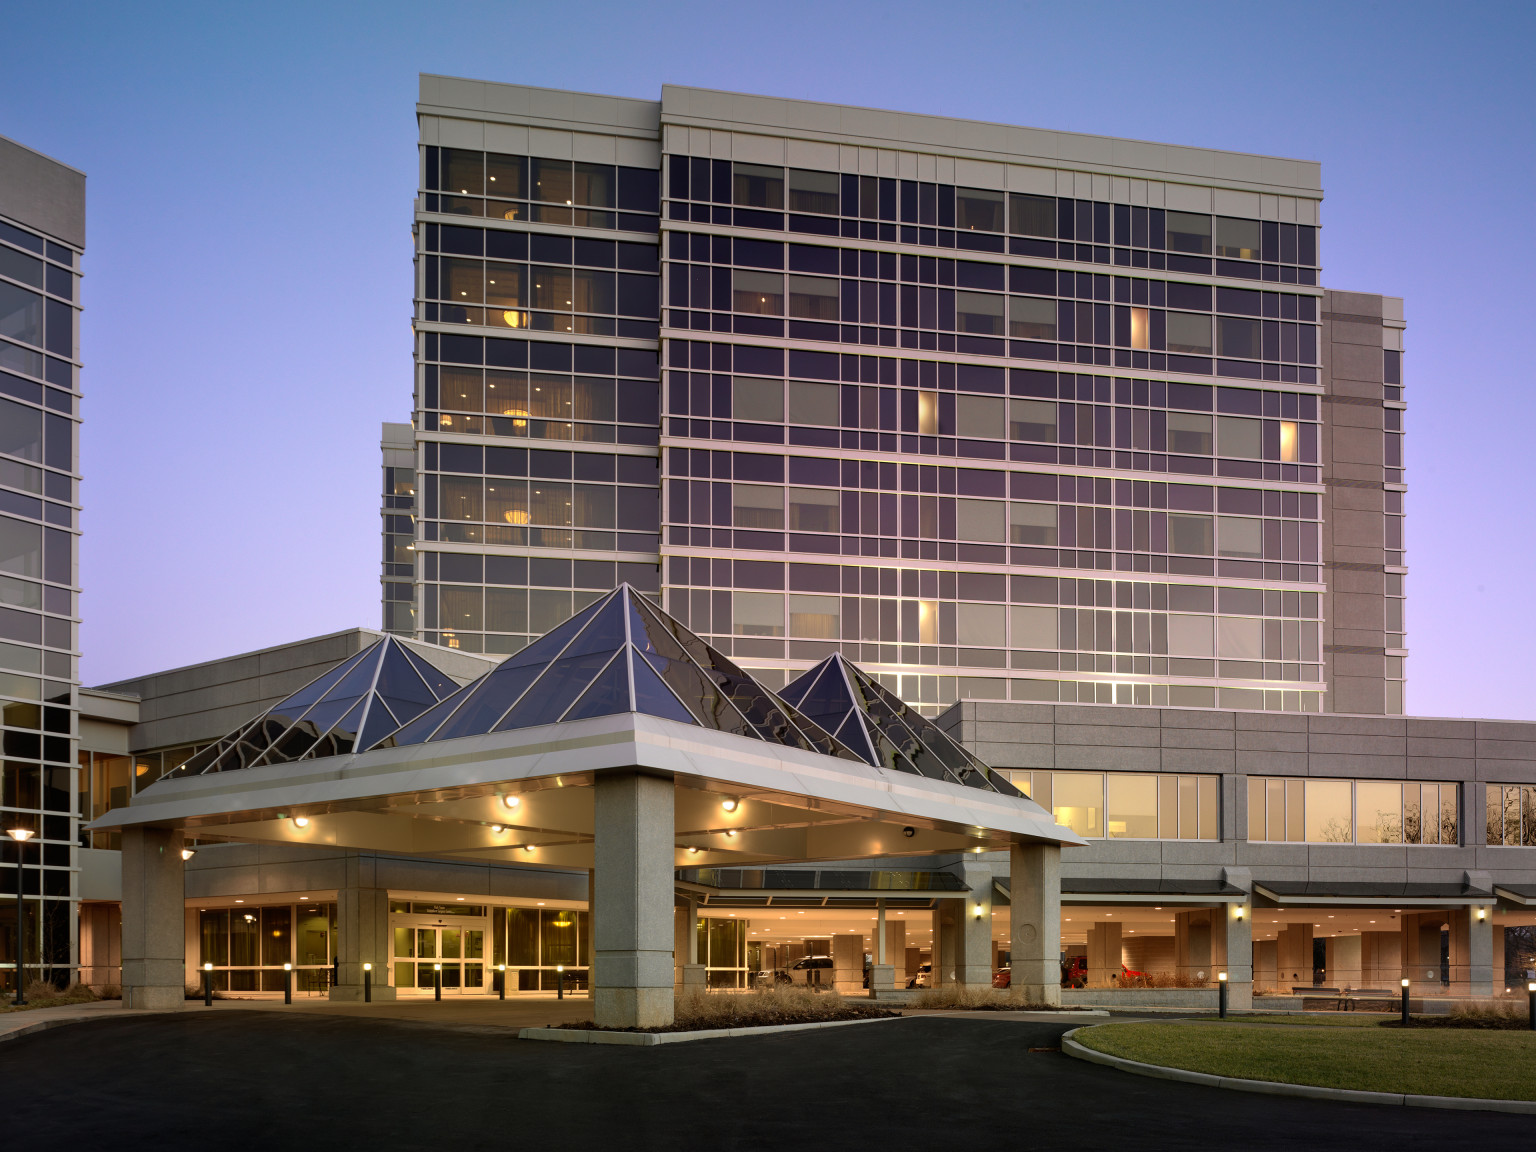 Baptist Health Louisville | Engberg Anderson Architects